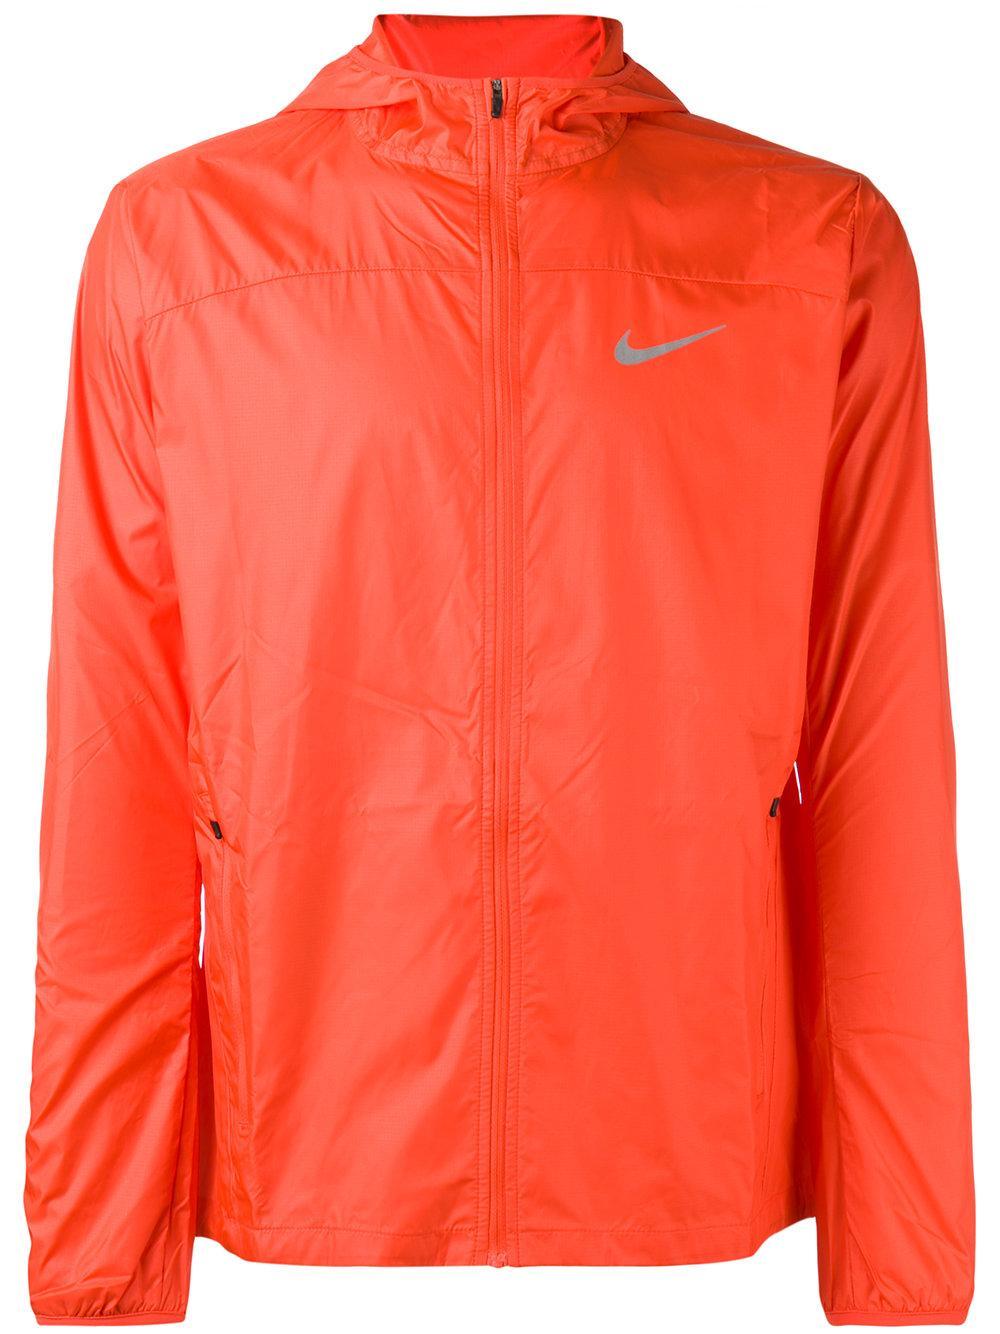 Nike Shield Running Jacket In Orange For Men Lyst